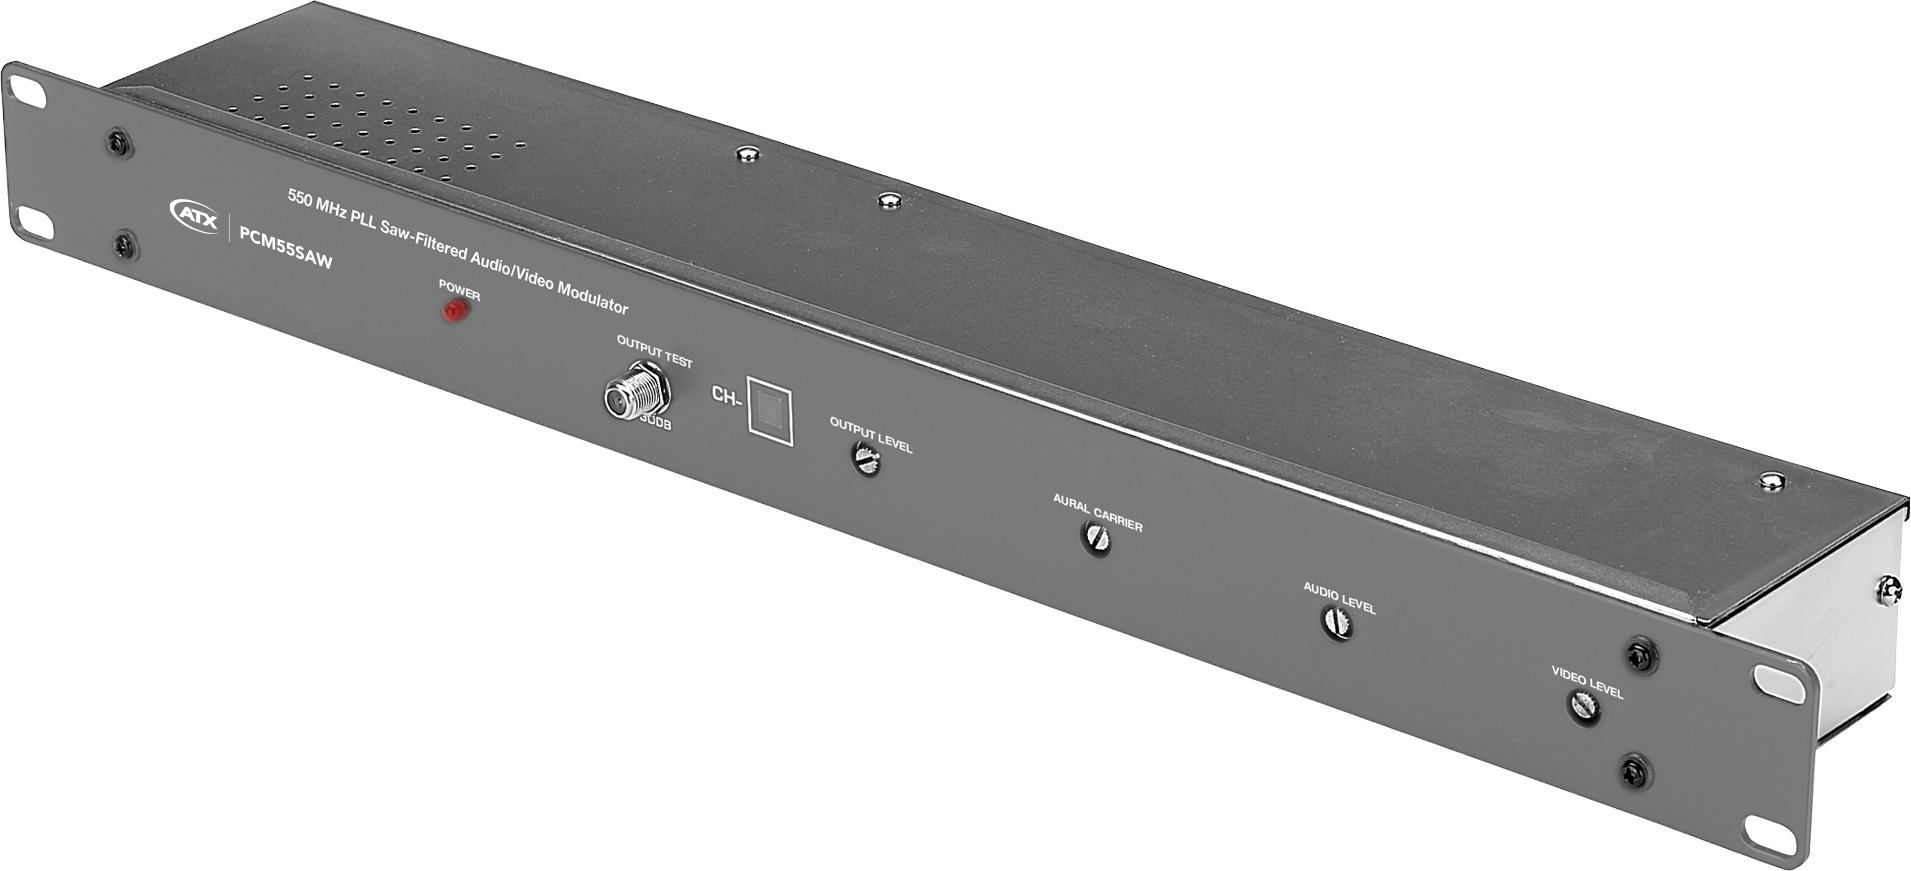 Pico Digital 1 Channel Crystal A/V Modulator - Channel T - 276-282 MHz